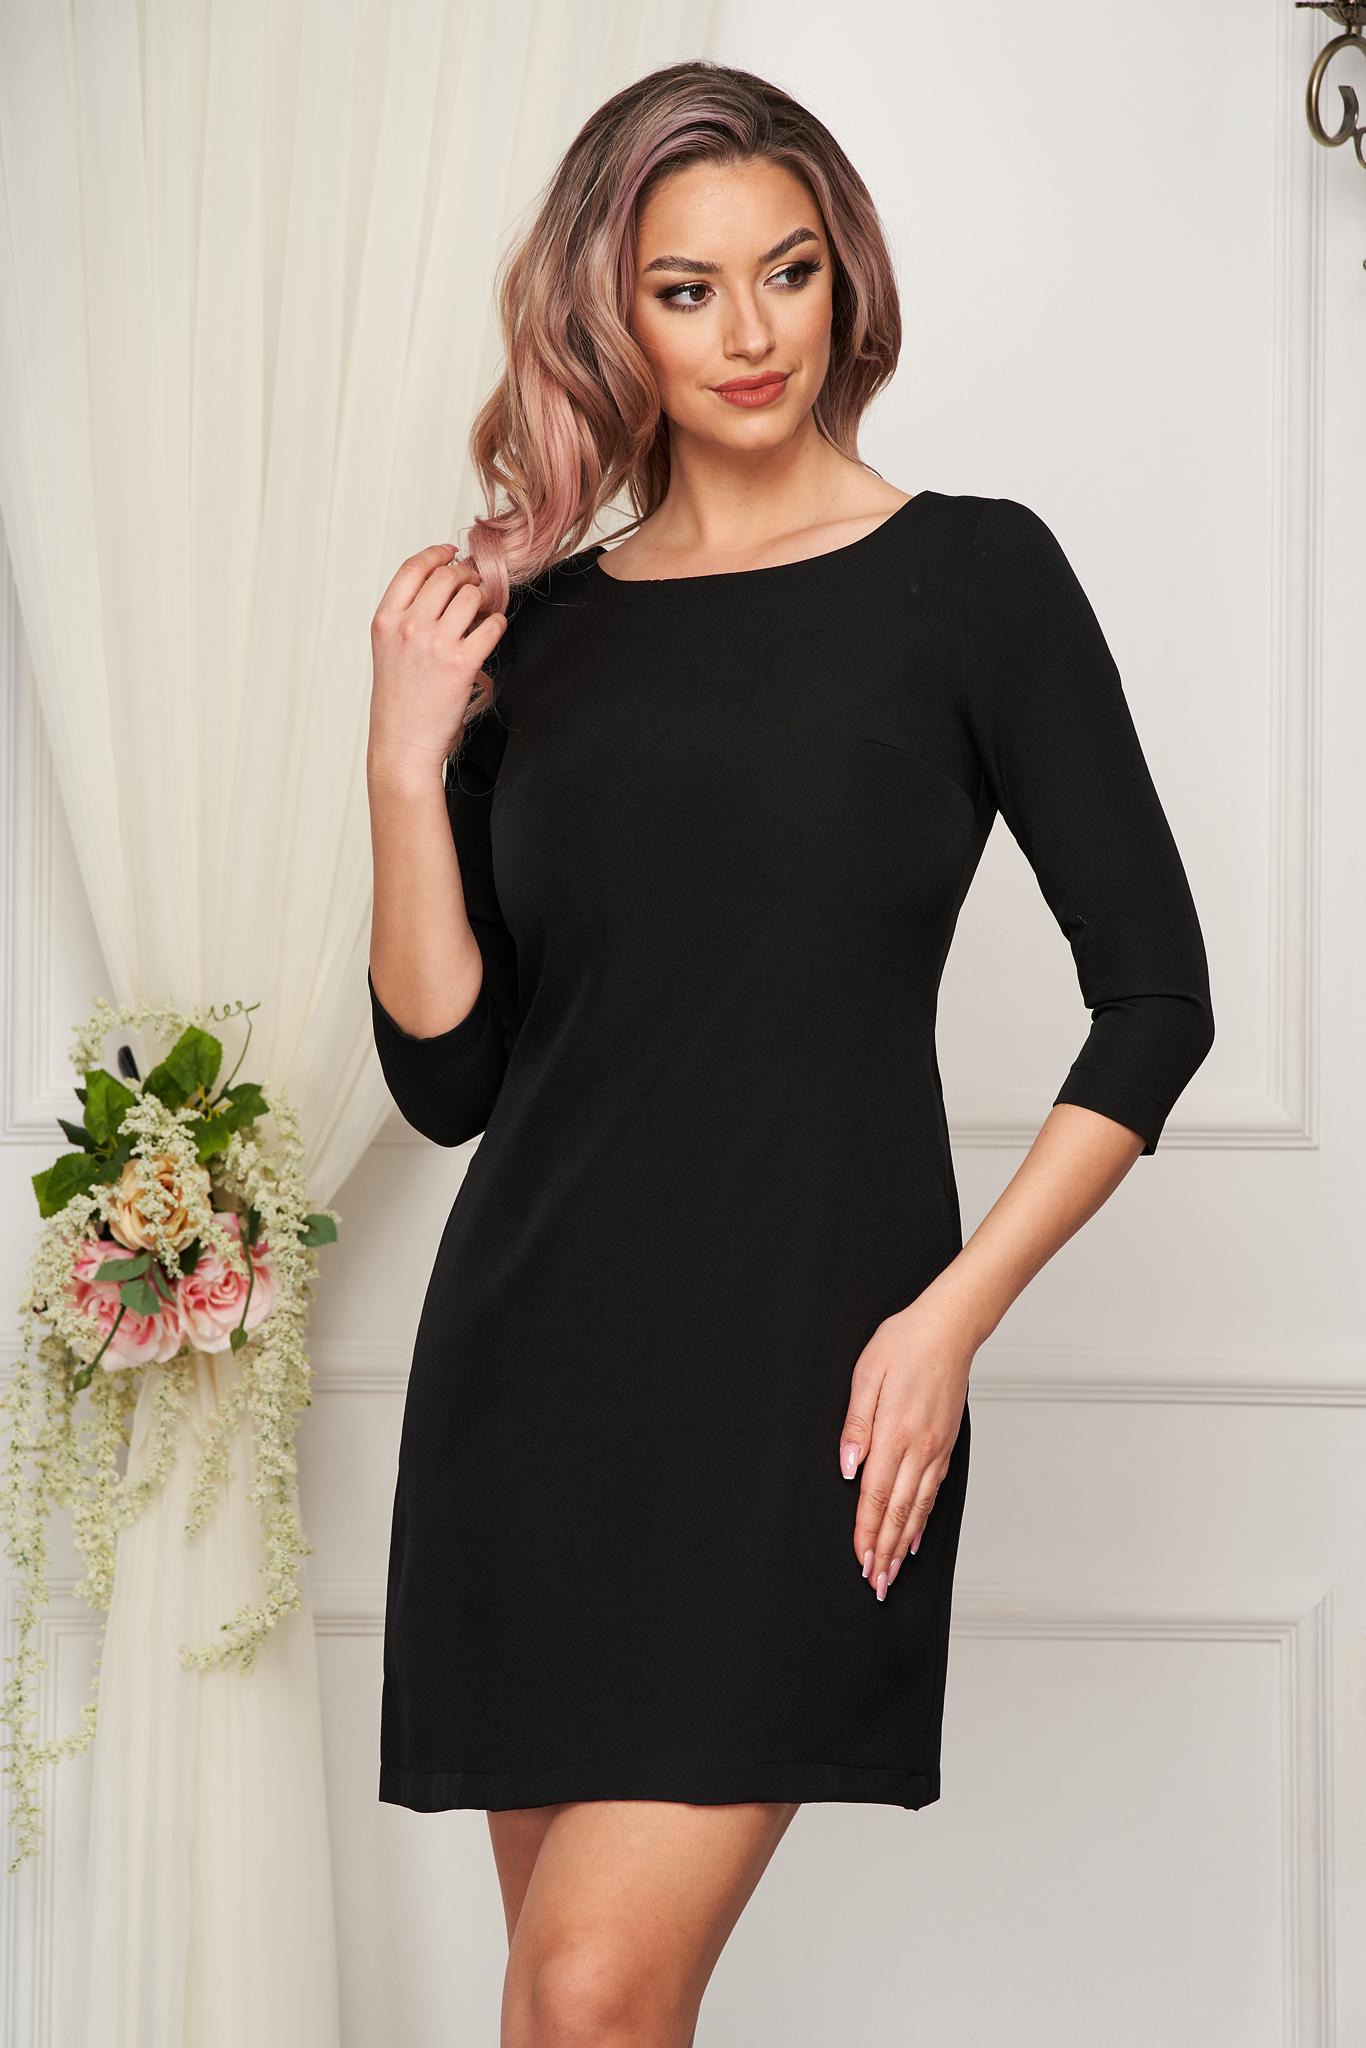 Dress StarShinerS black elegant short cut straight slightly elastic fabric